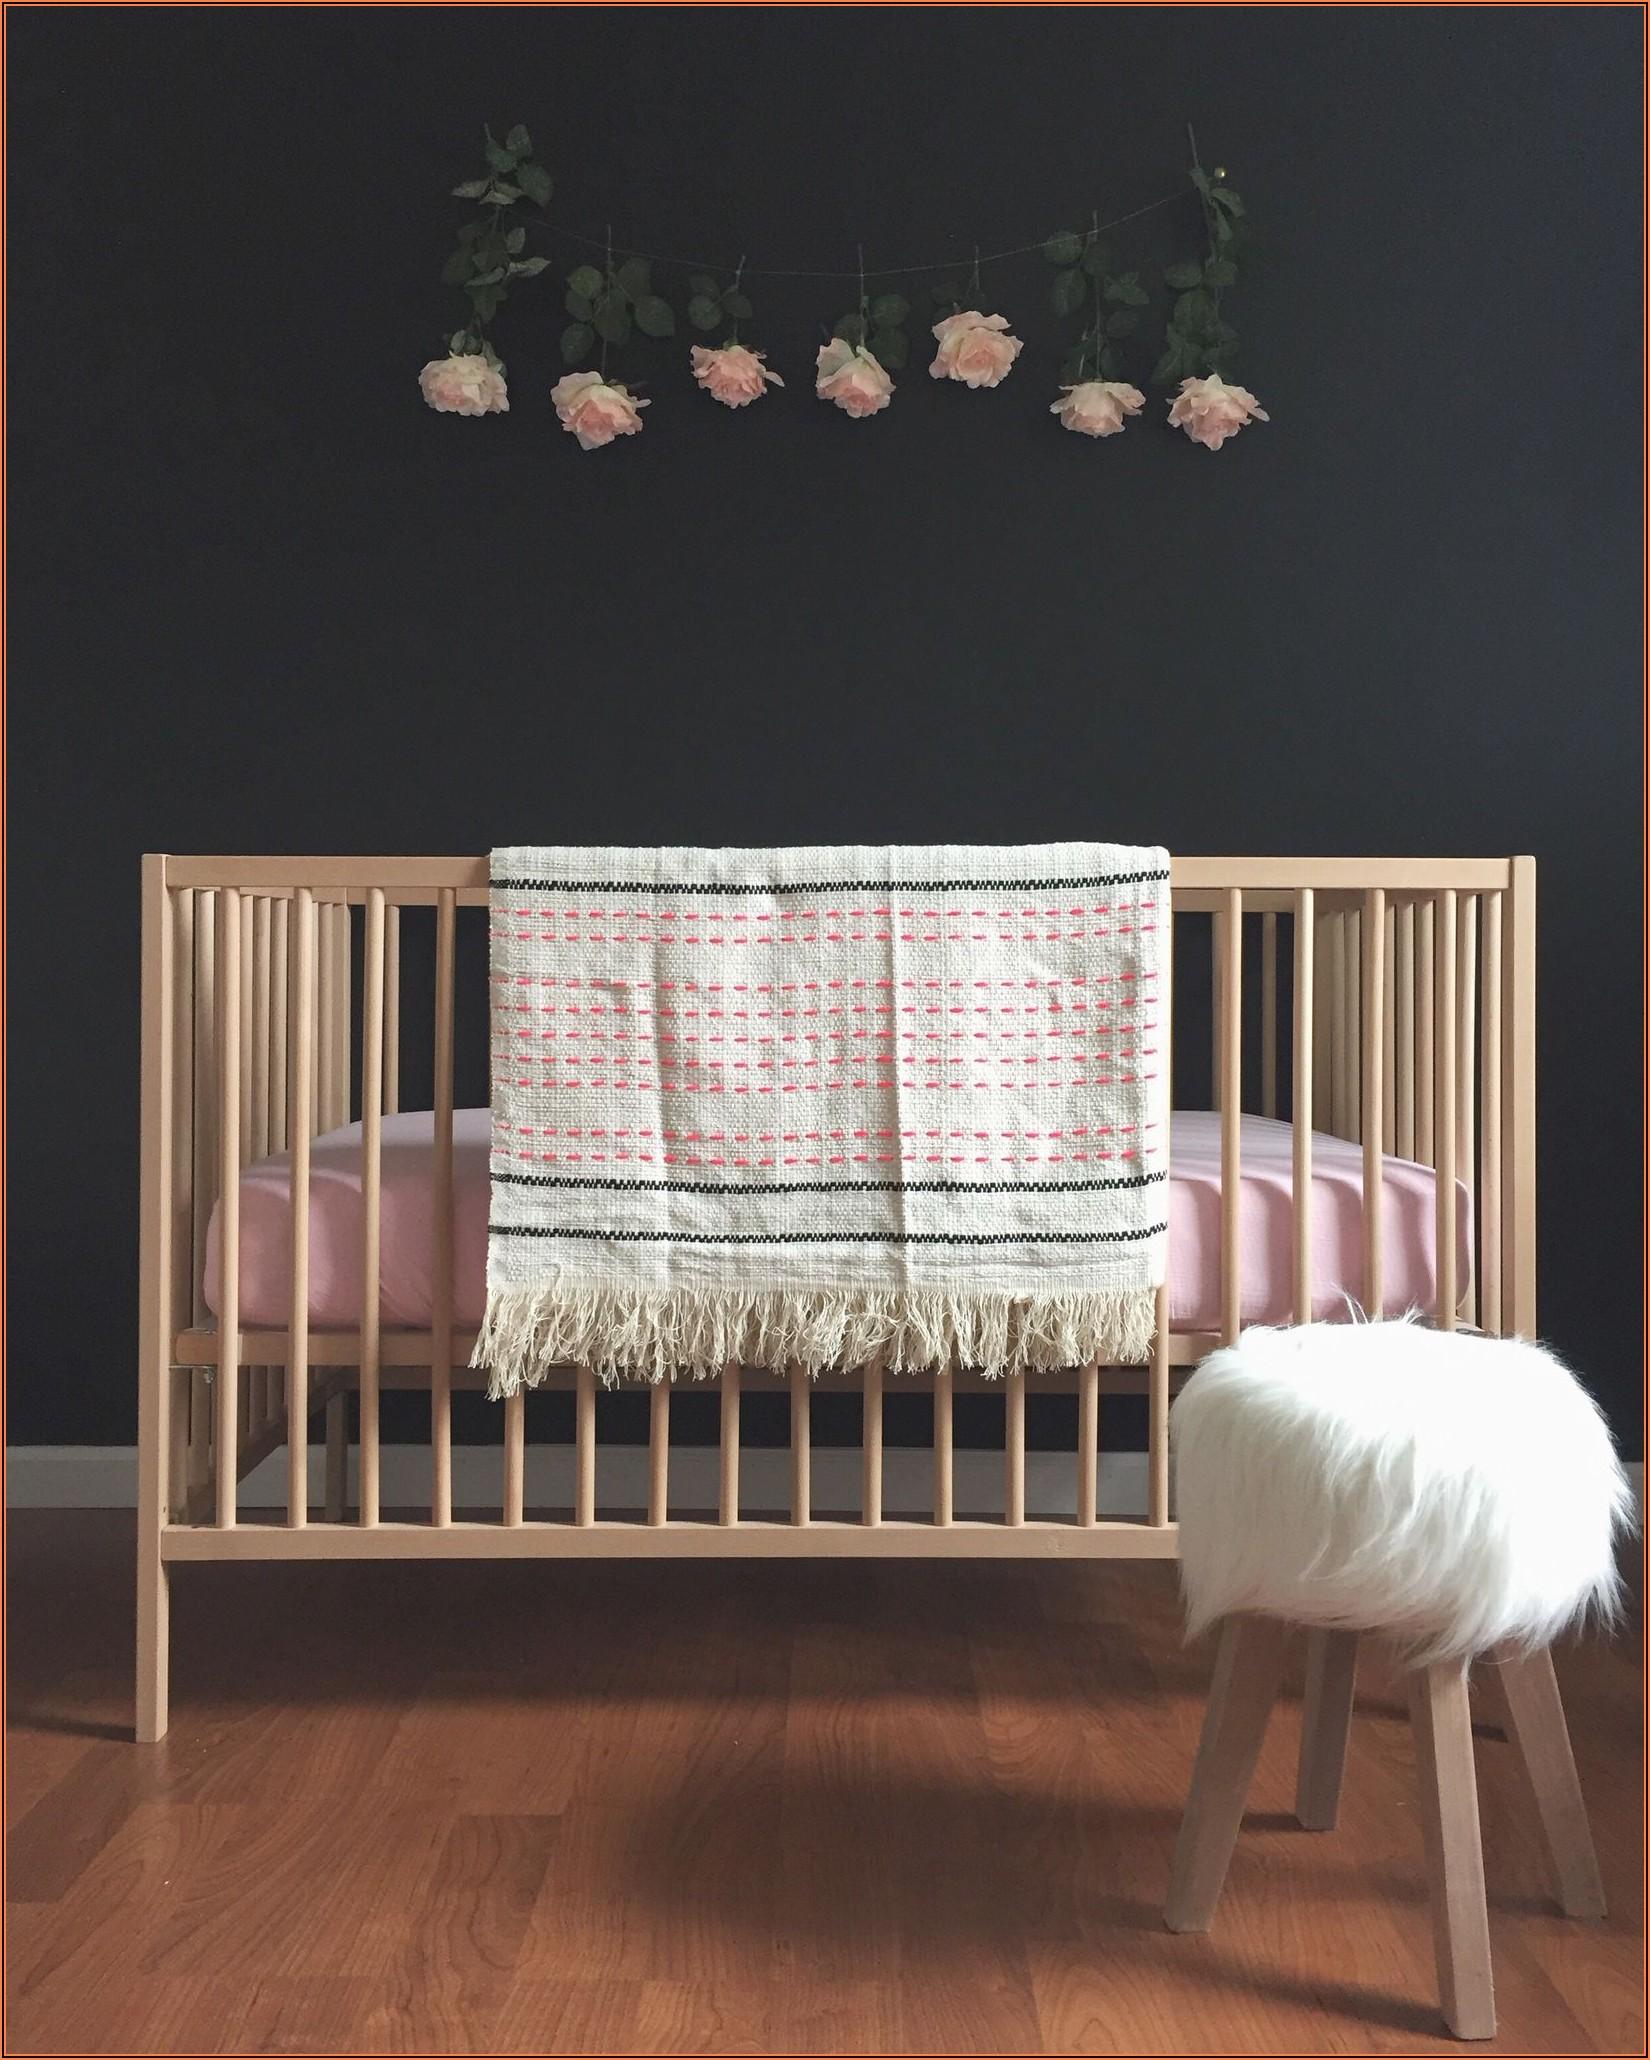 Kinderzimmer Tapete Ikea